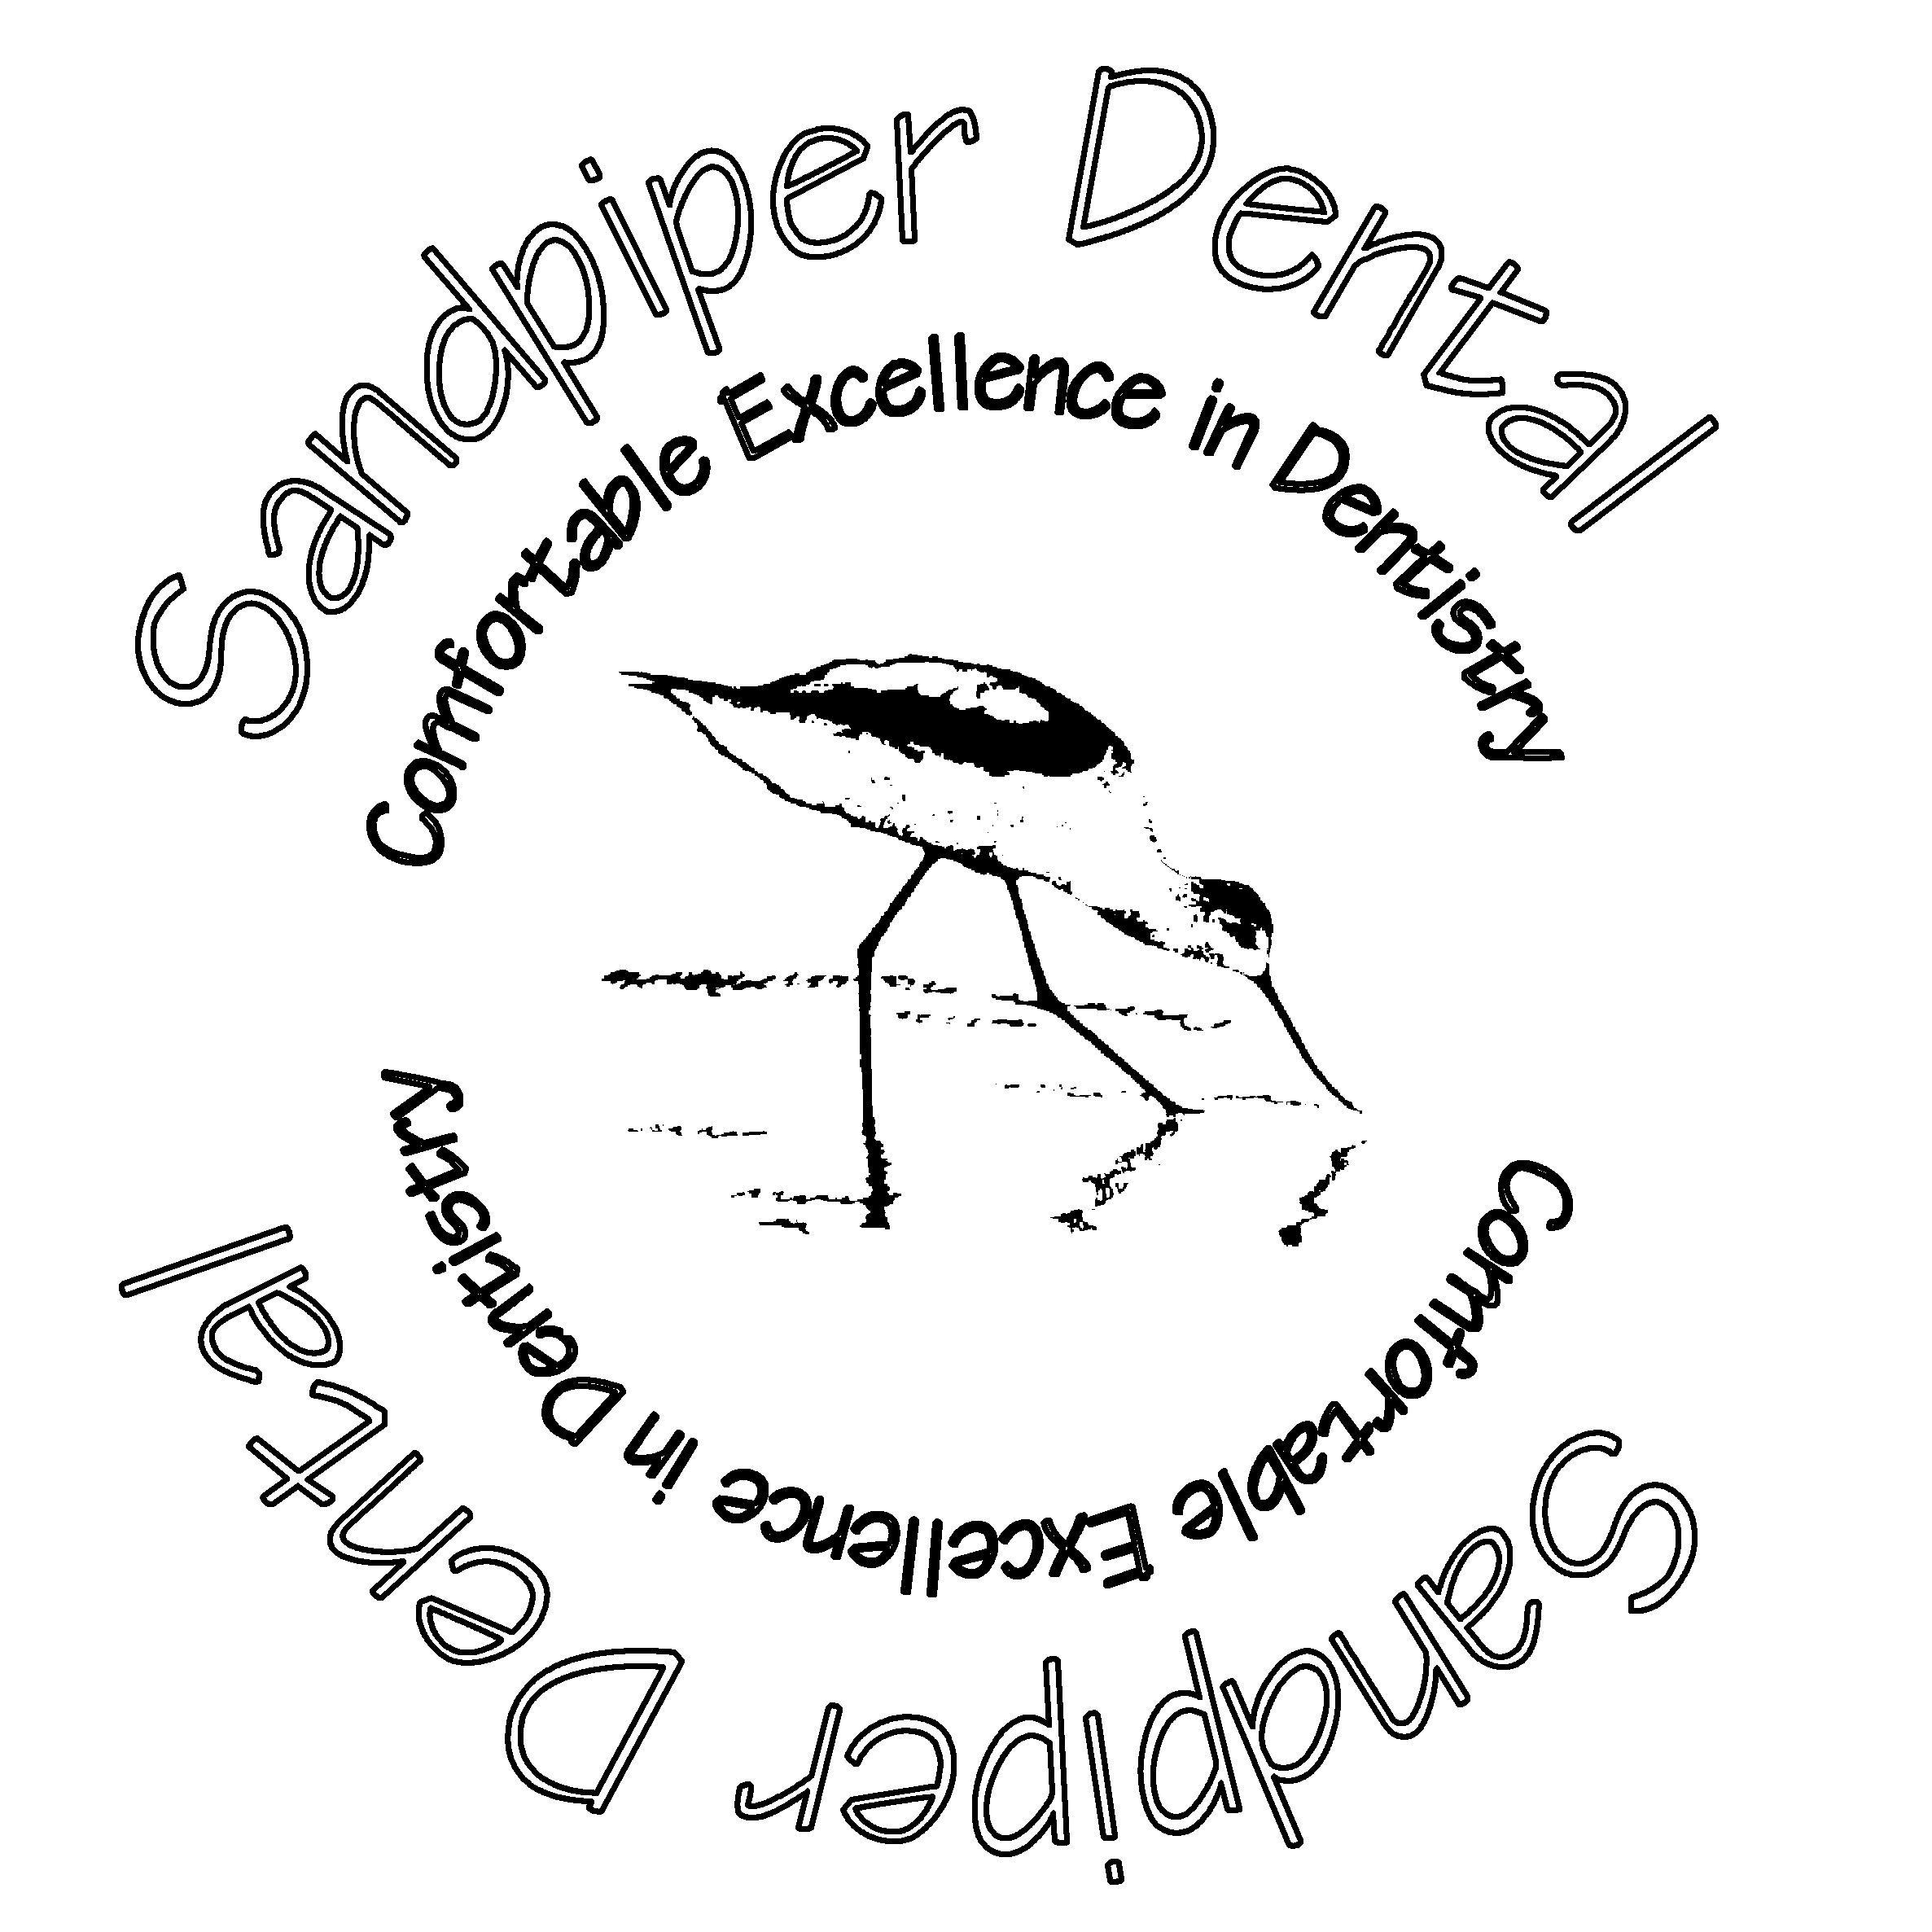 Sandpiper Dental